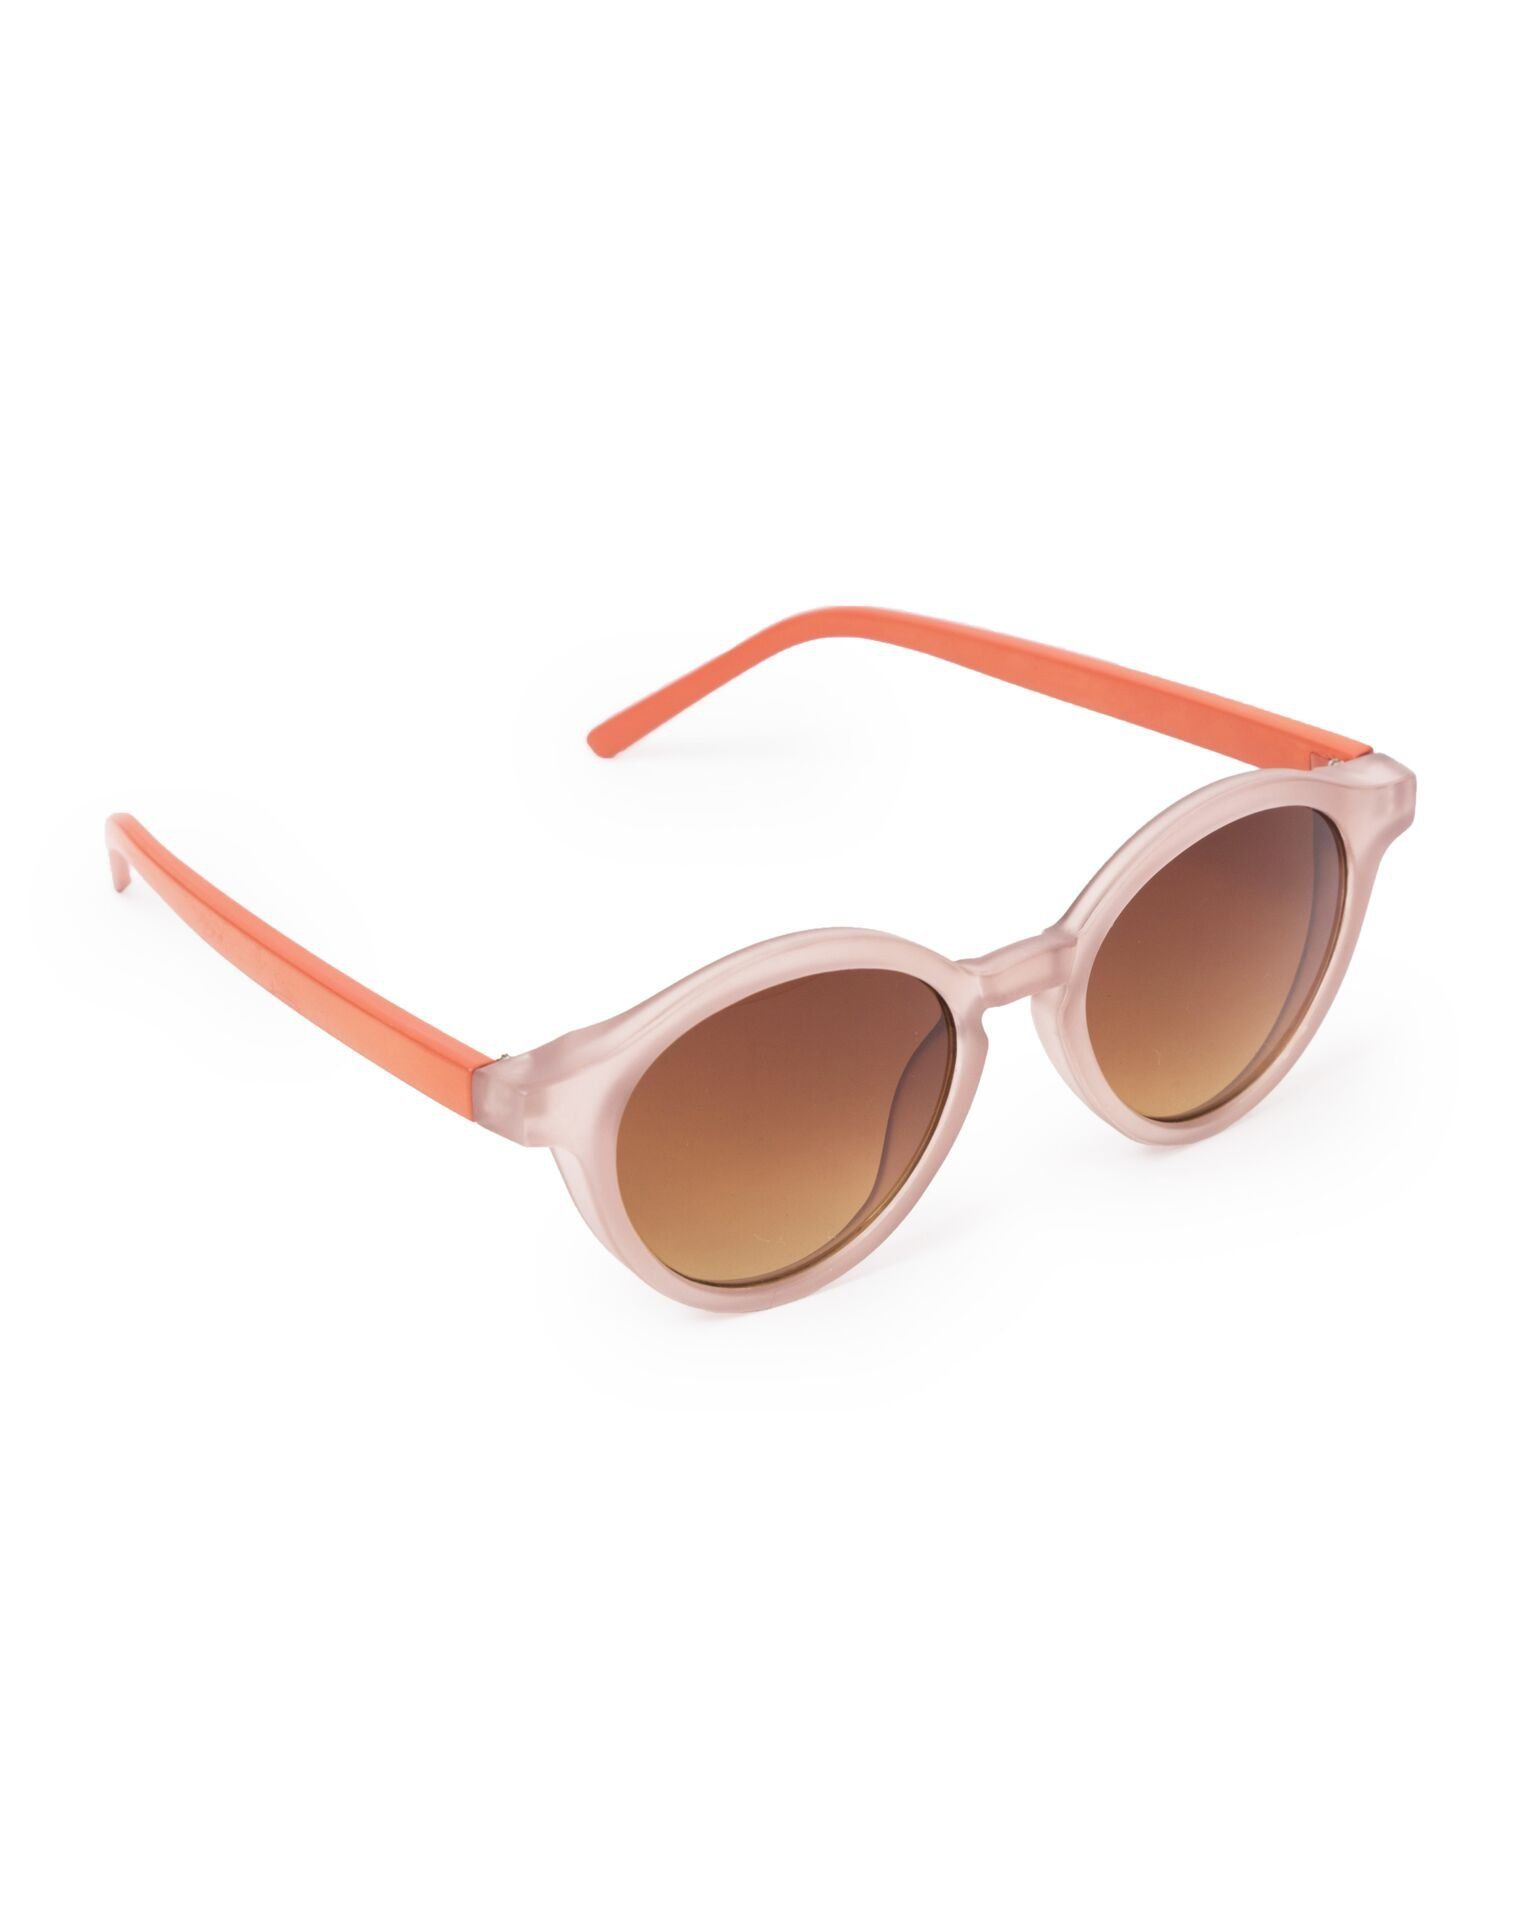 Powder Miranda Sunglasses in Satsuma